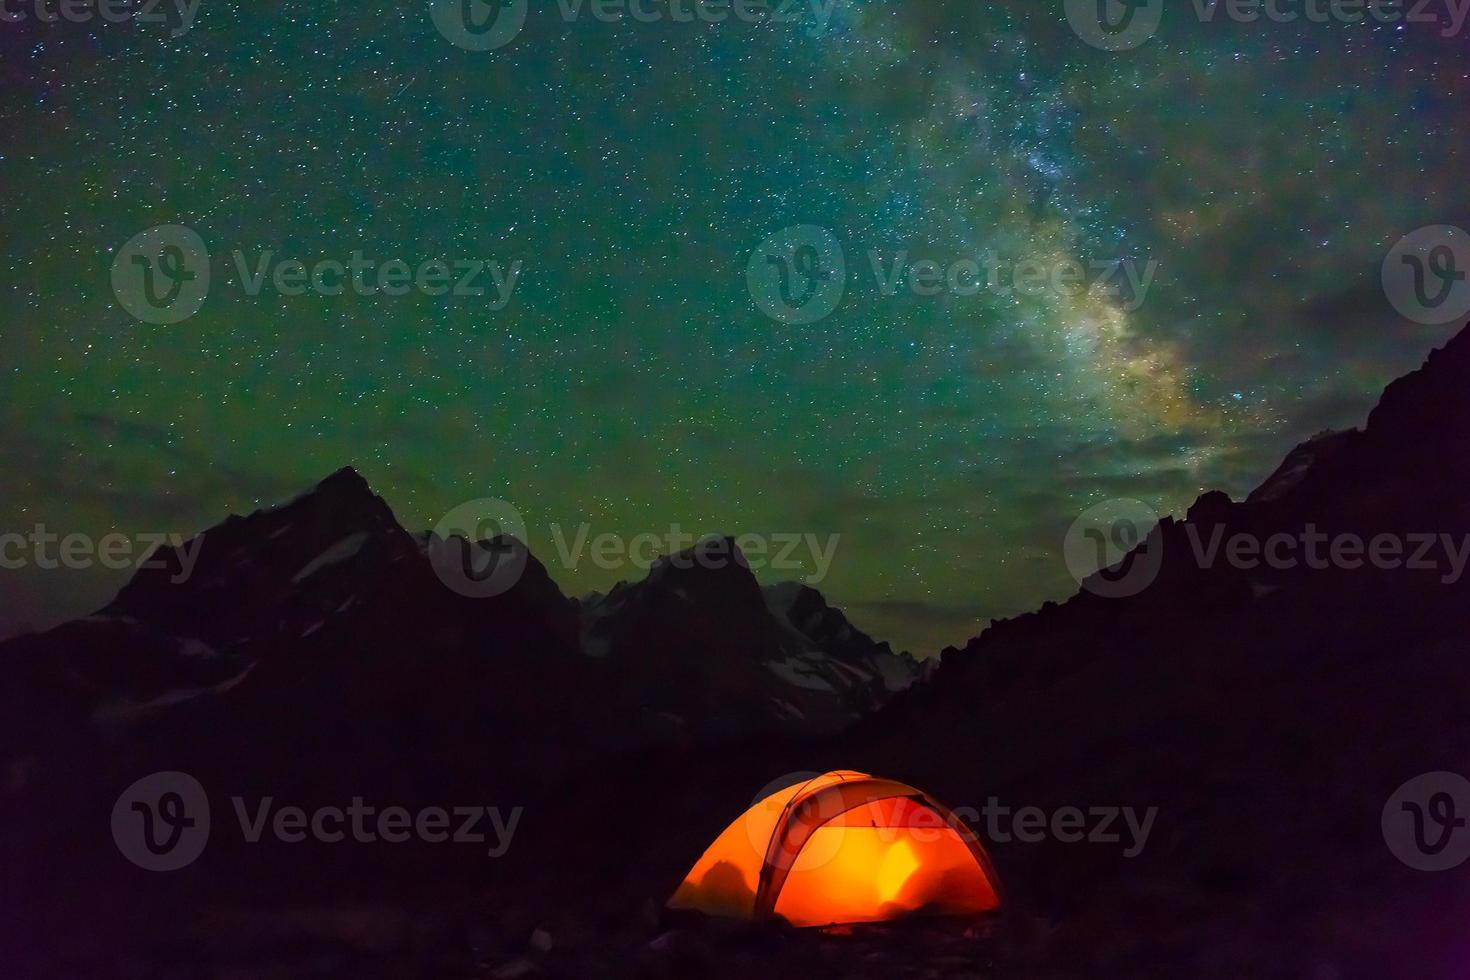 Night mountain landscape with illuminated tent photo